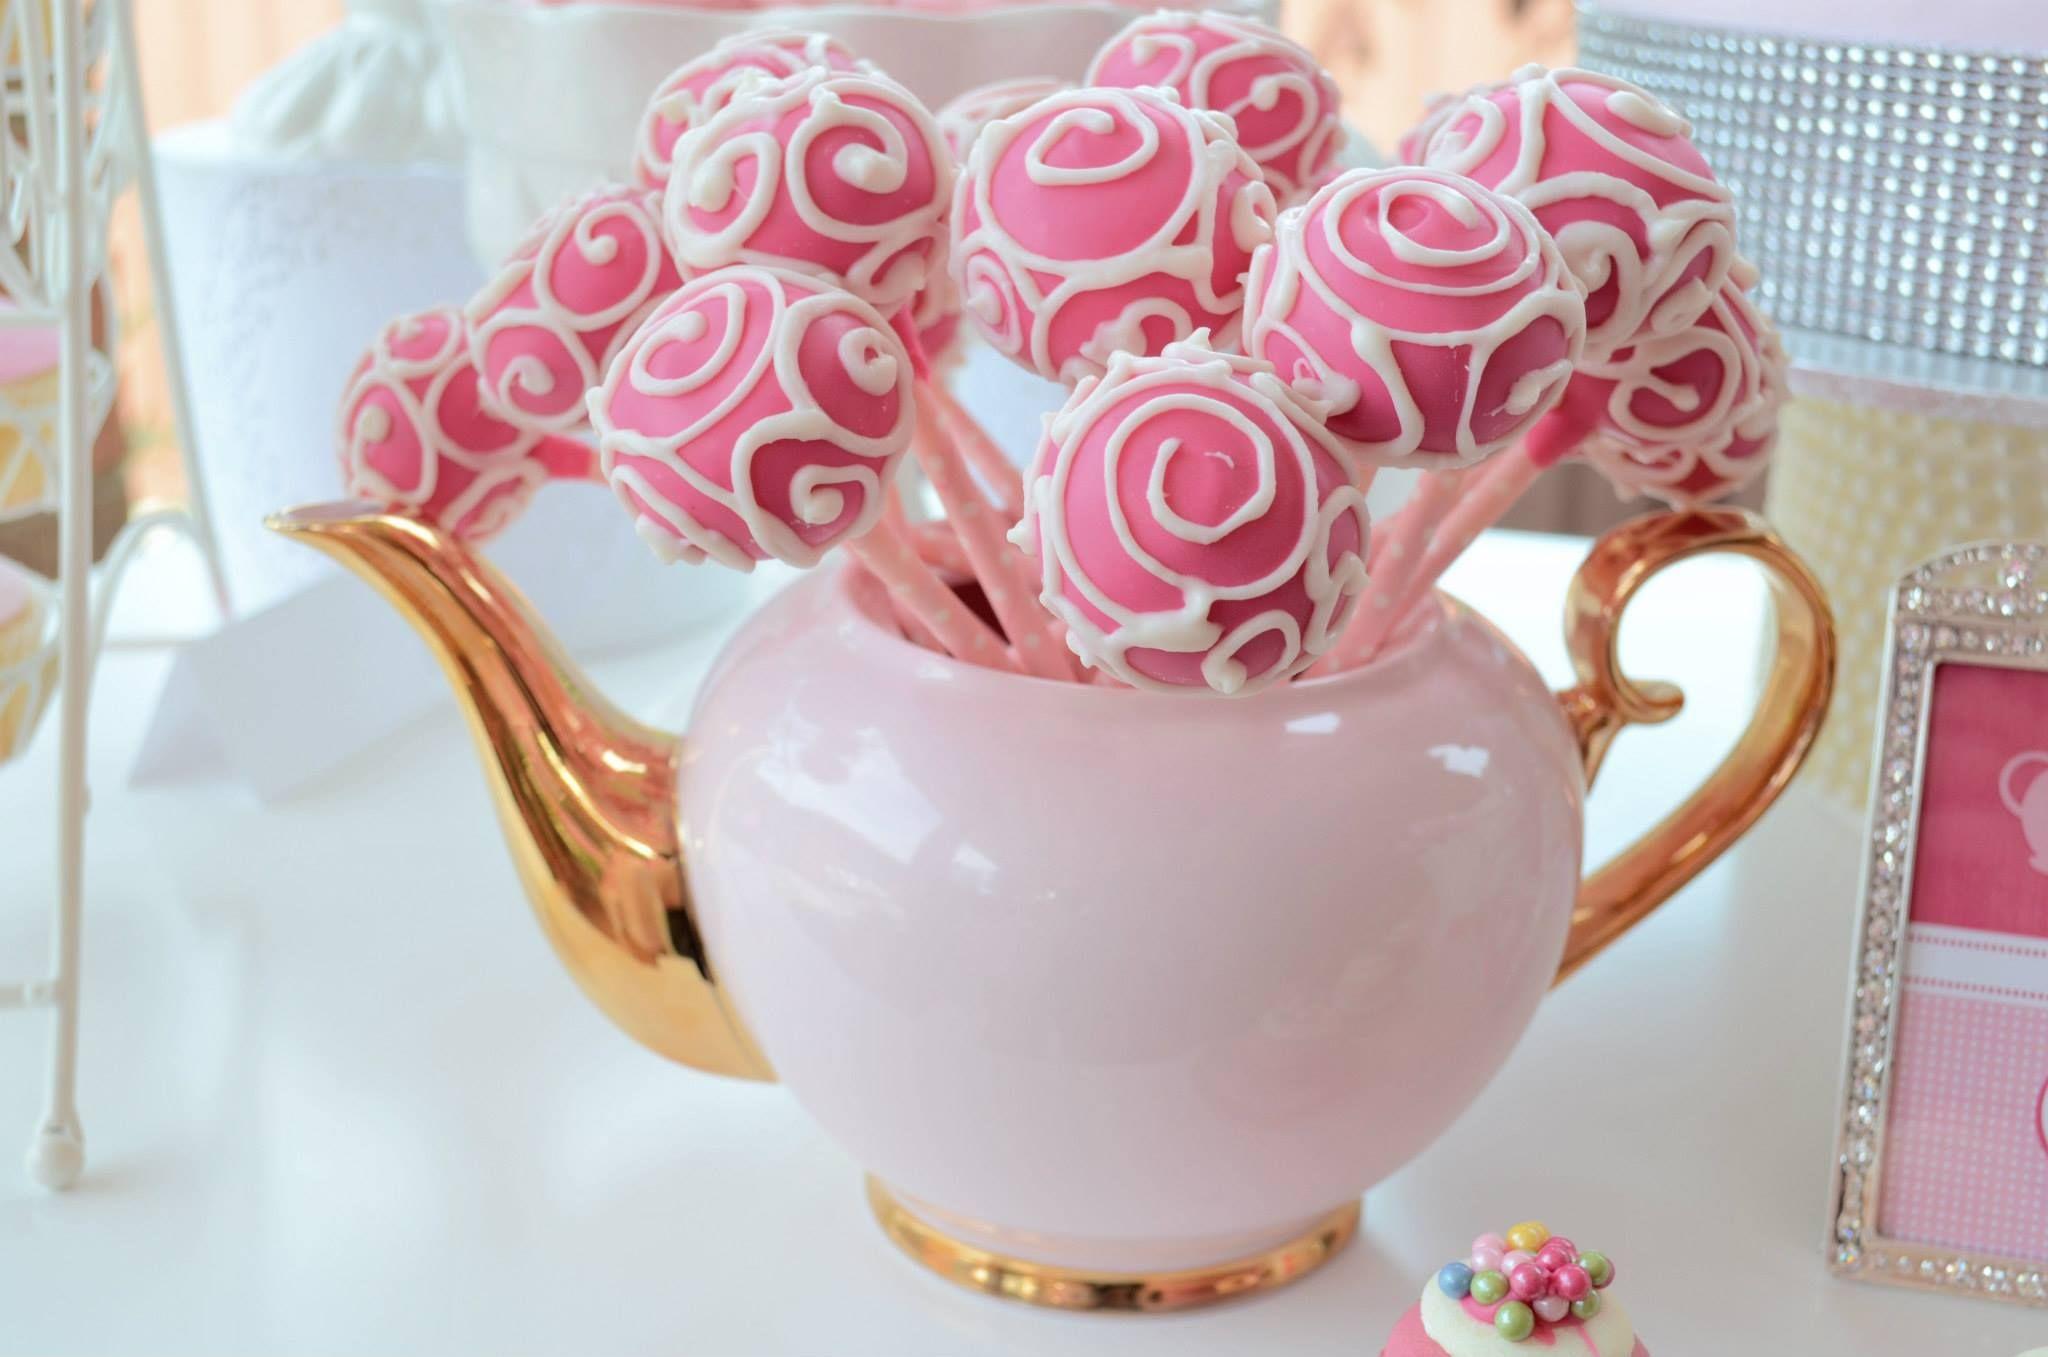 https://www.facebook.com/pages/Cakepop-Shoppe/446489155364555?ref ...